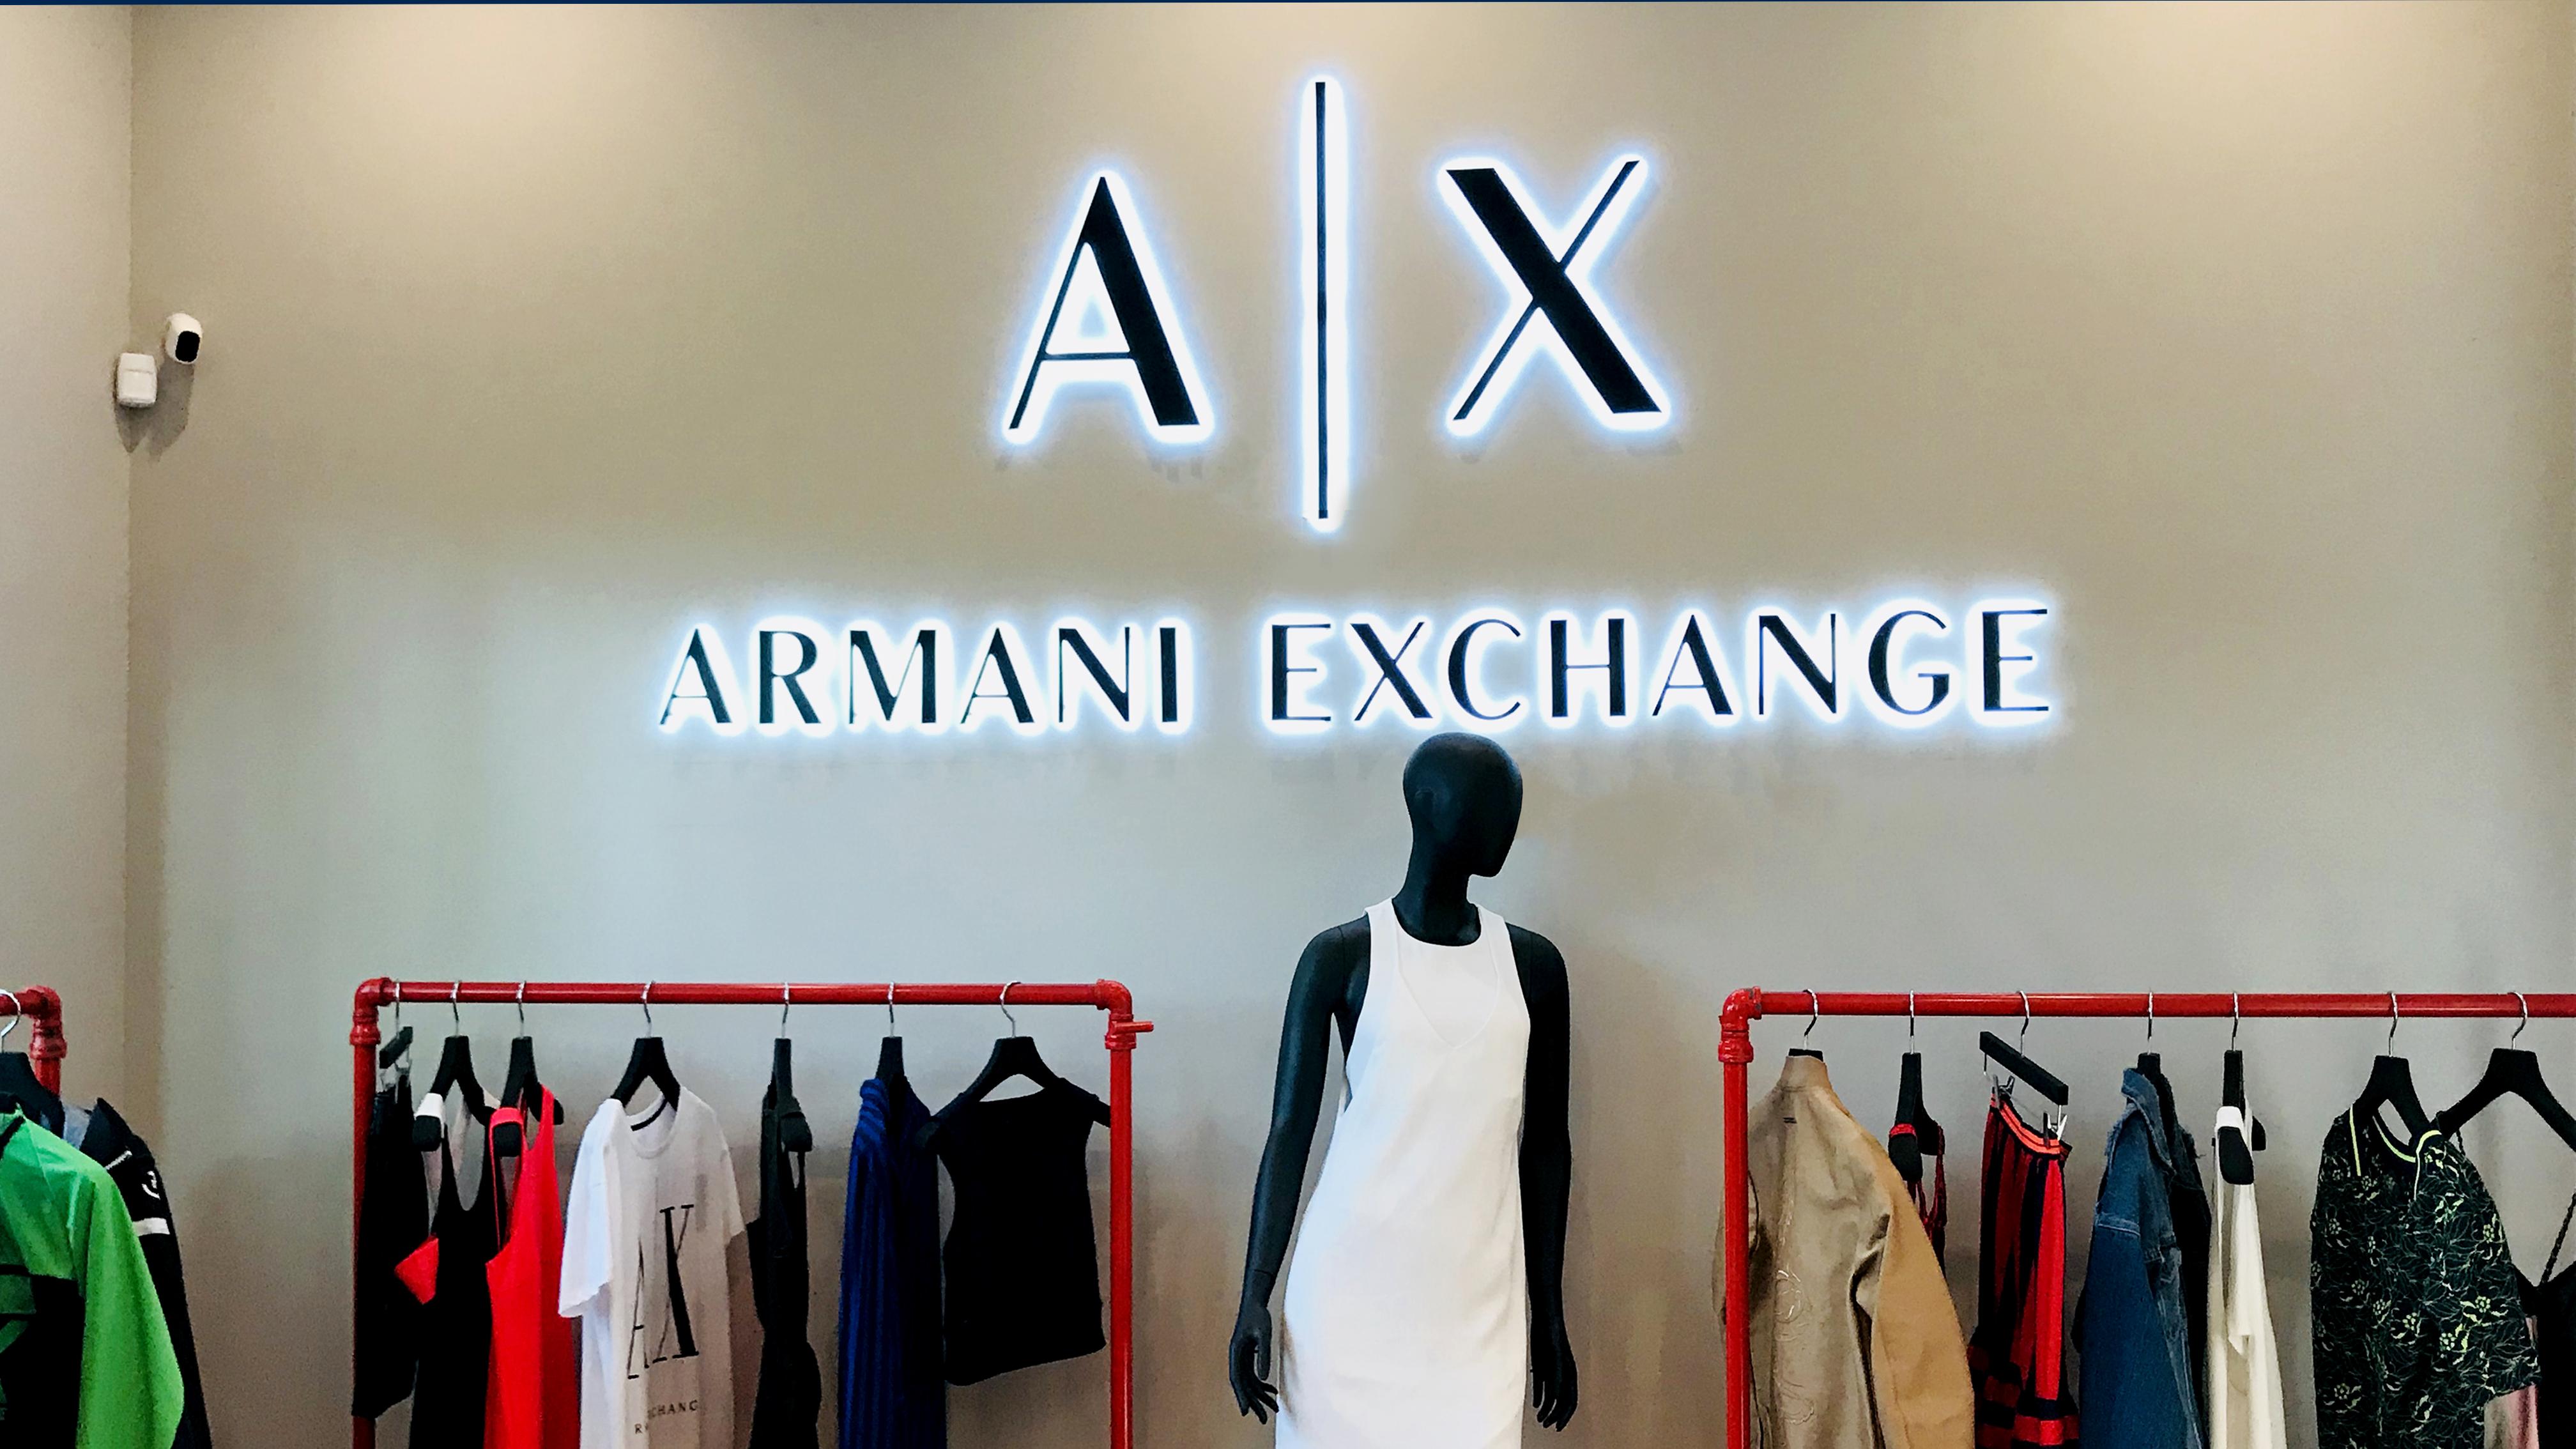 Armani exchange backlit letters